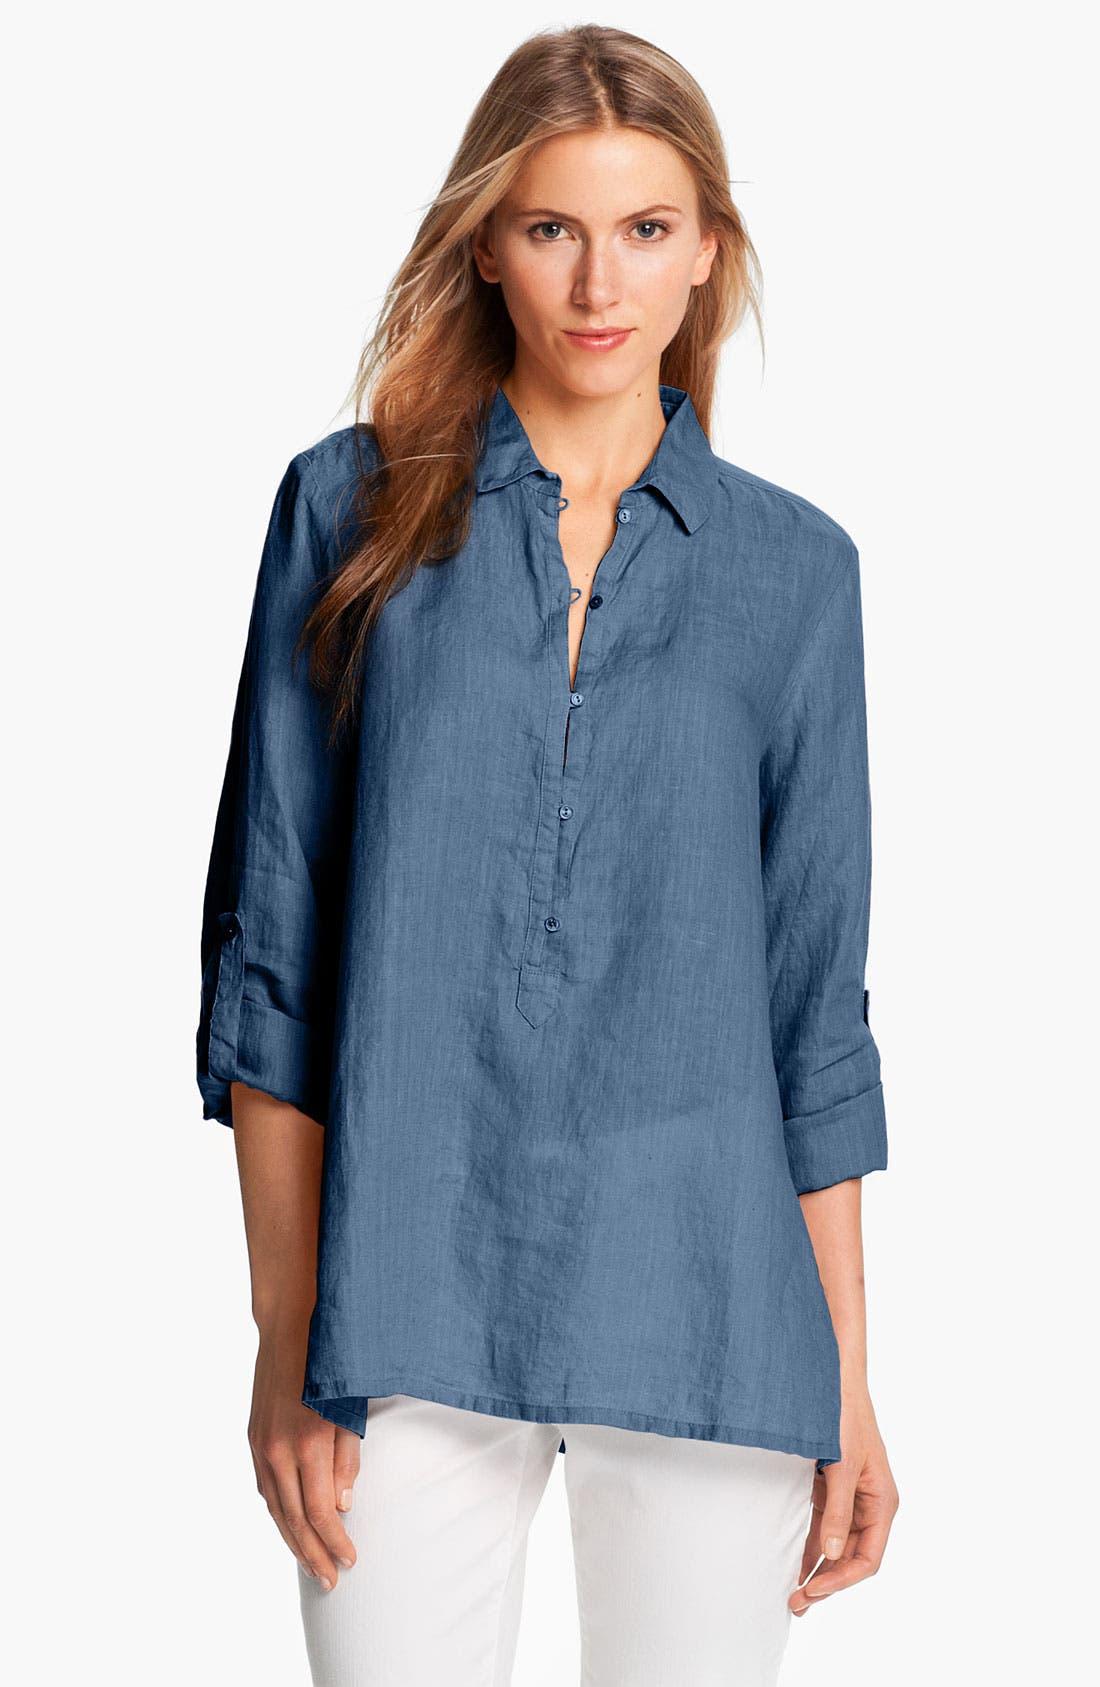 Main Image - Eileen Fisher Laundered Handkerchief Linen Shirt